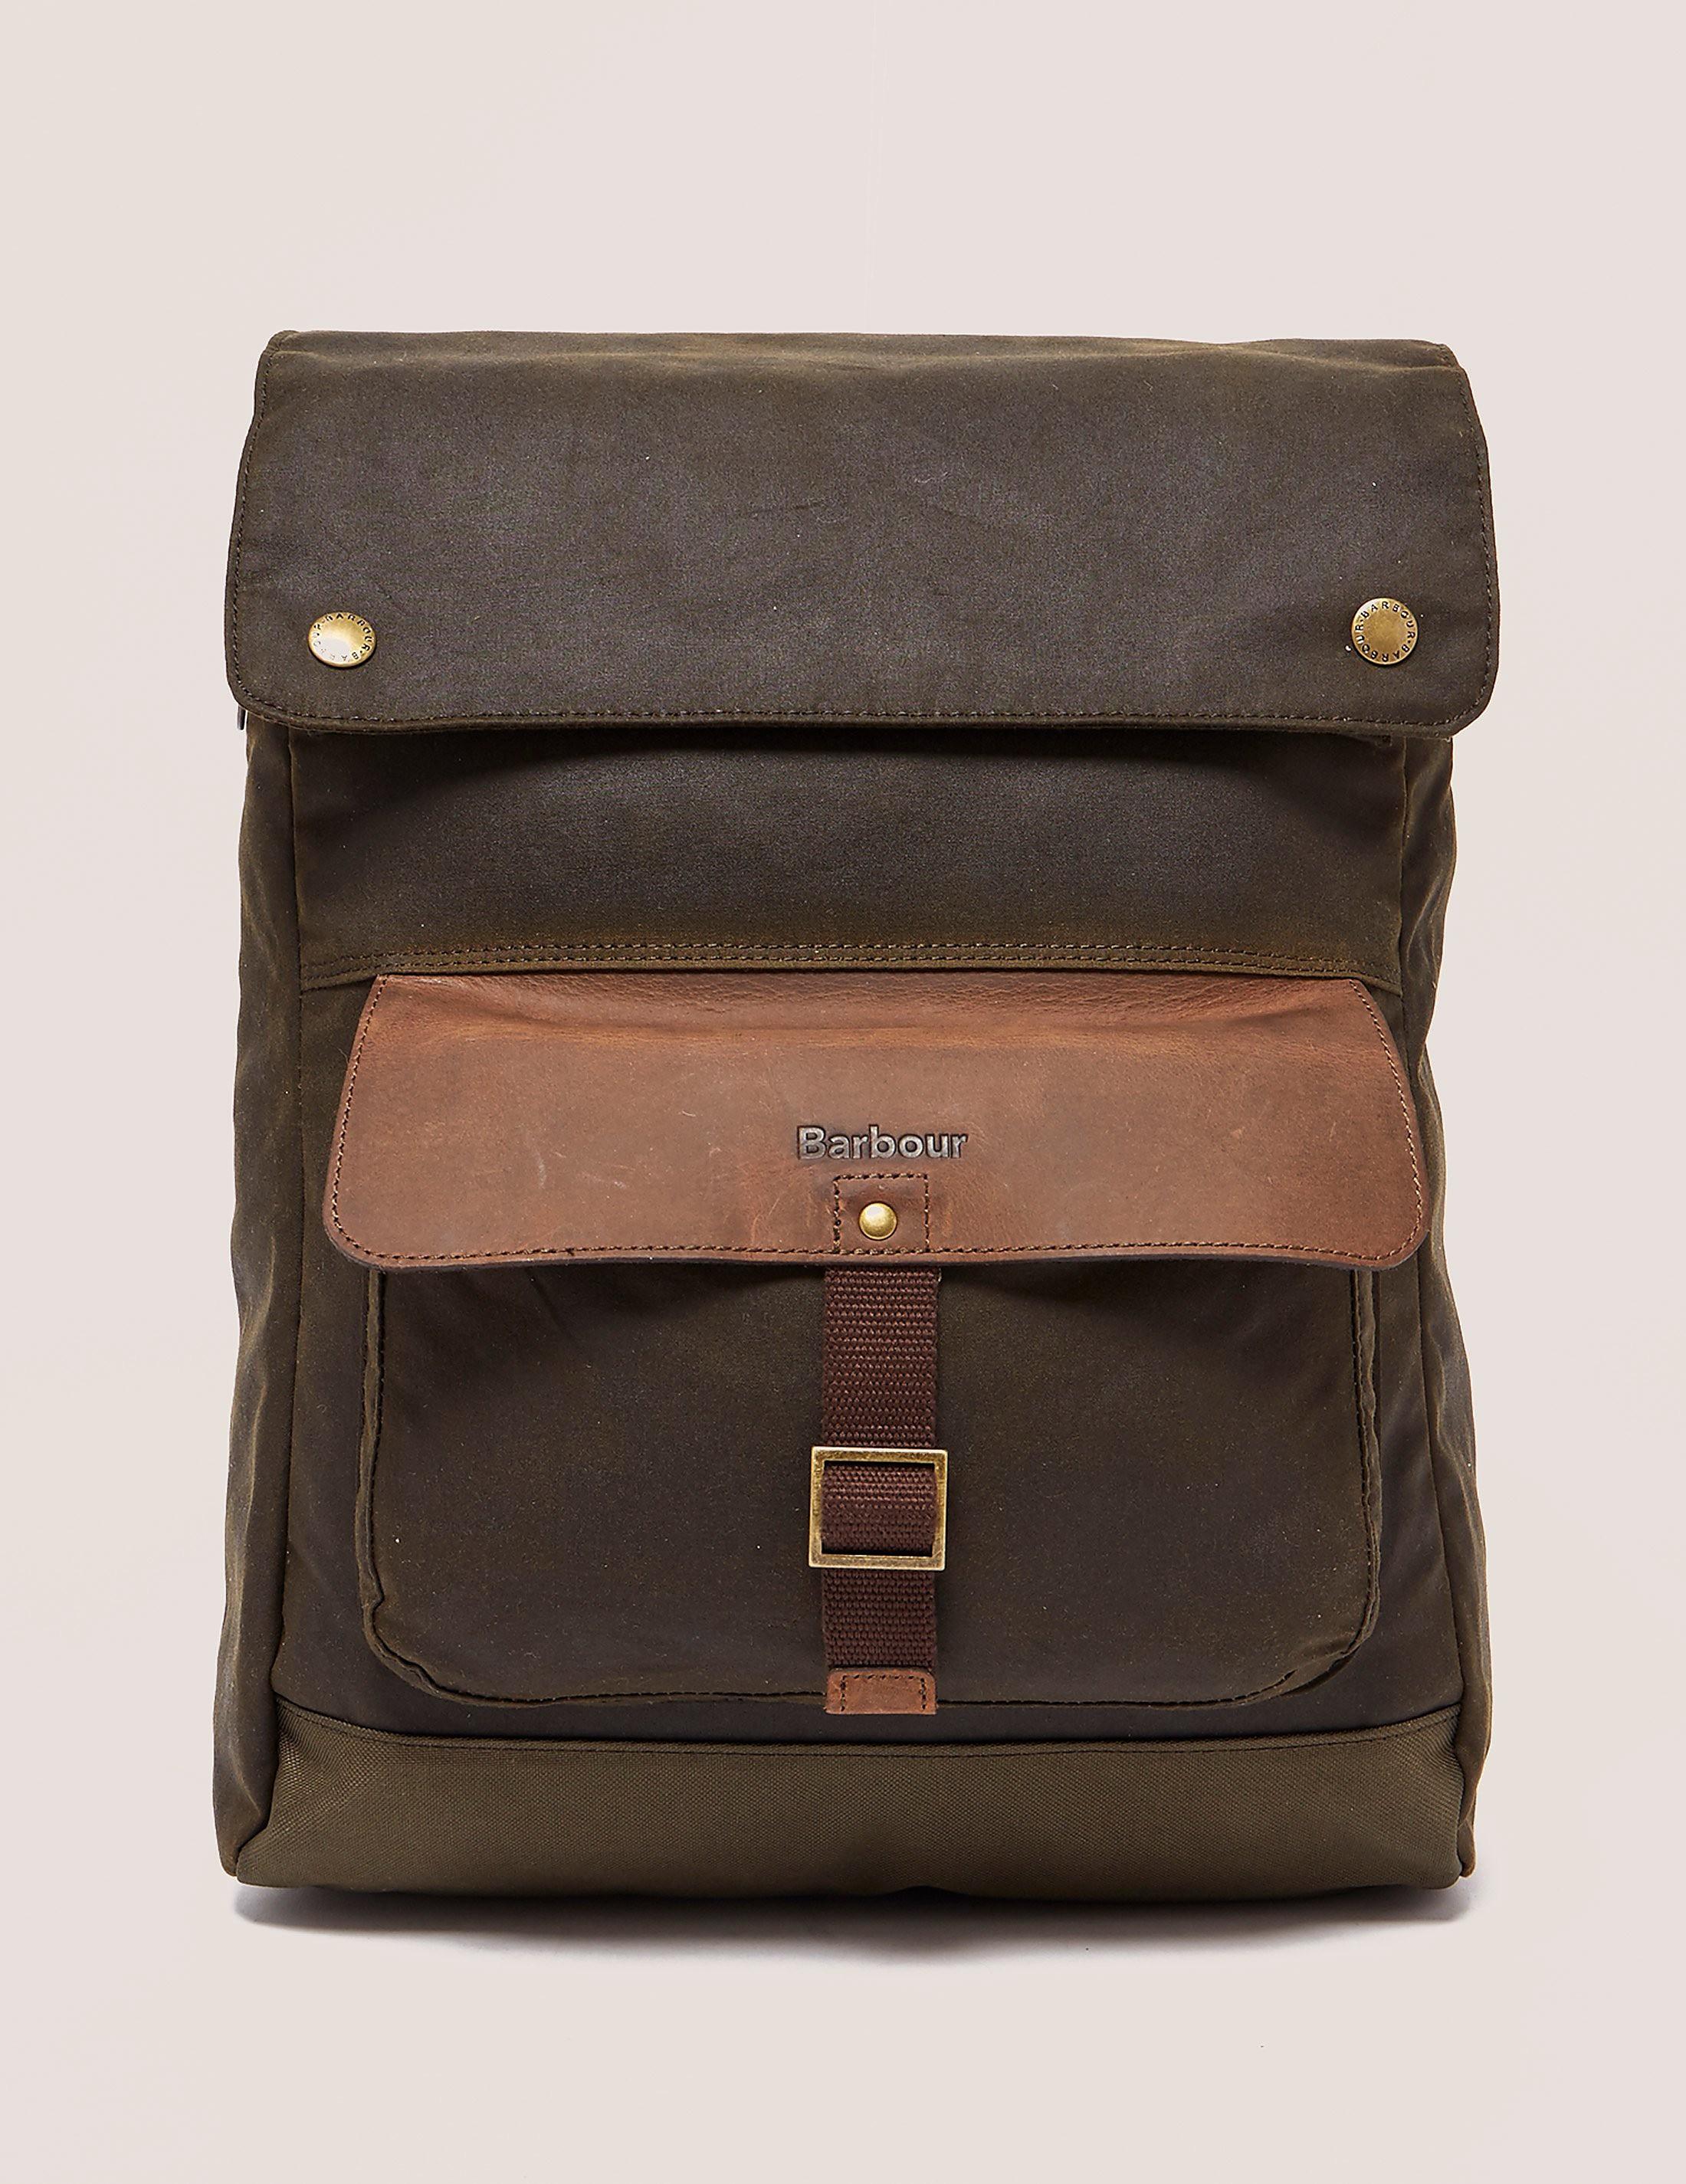 Barbour Wax Urban Backpack